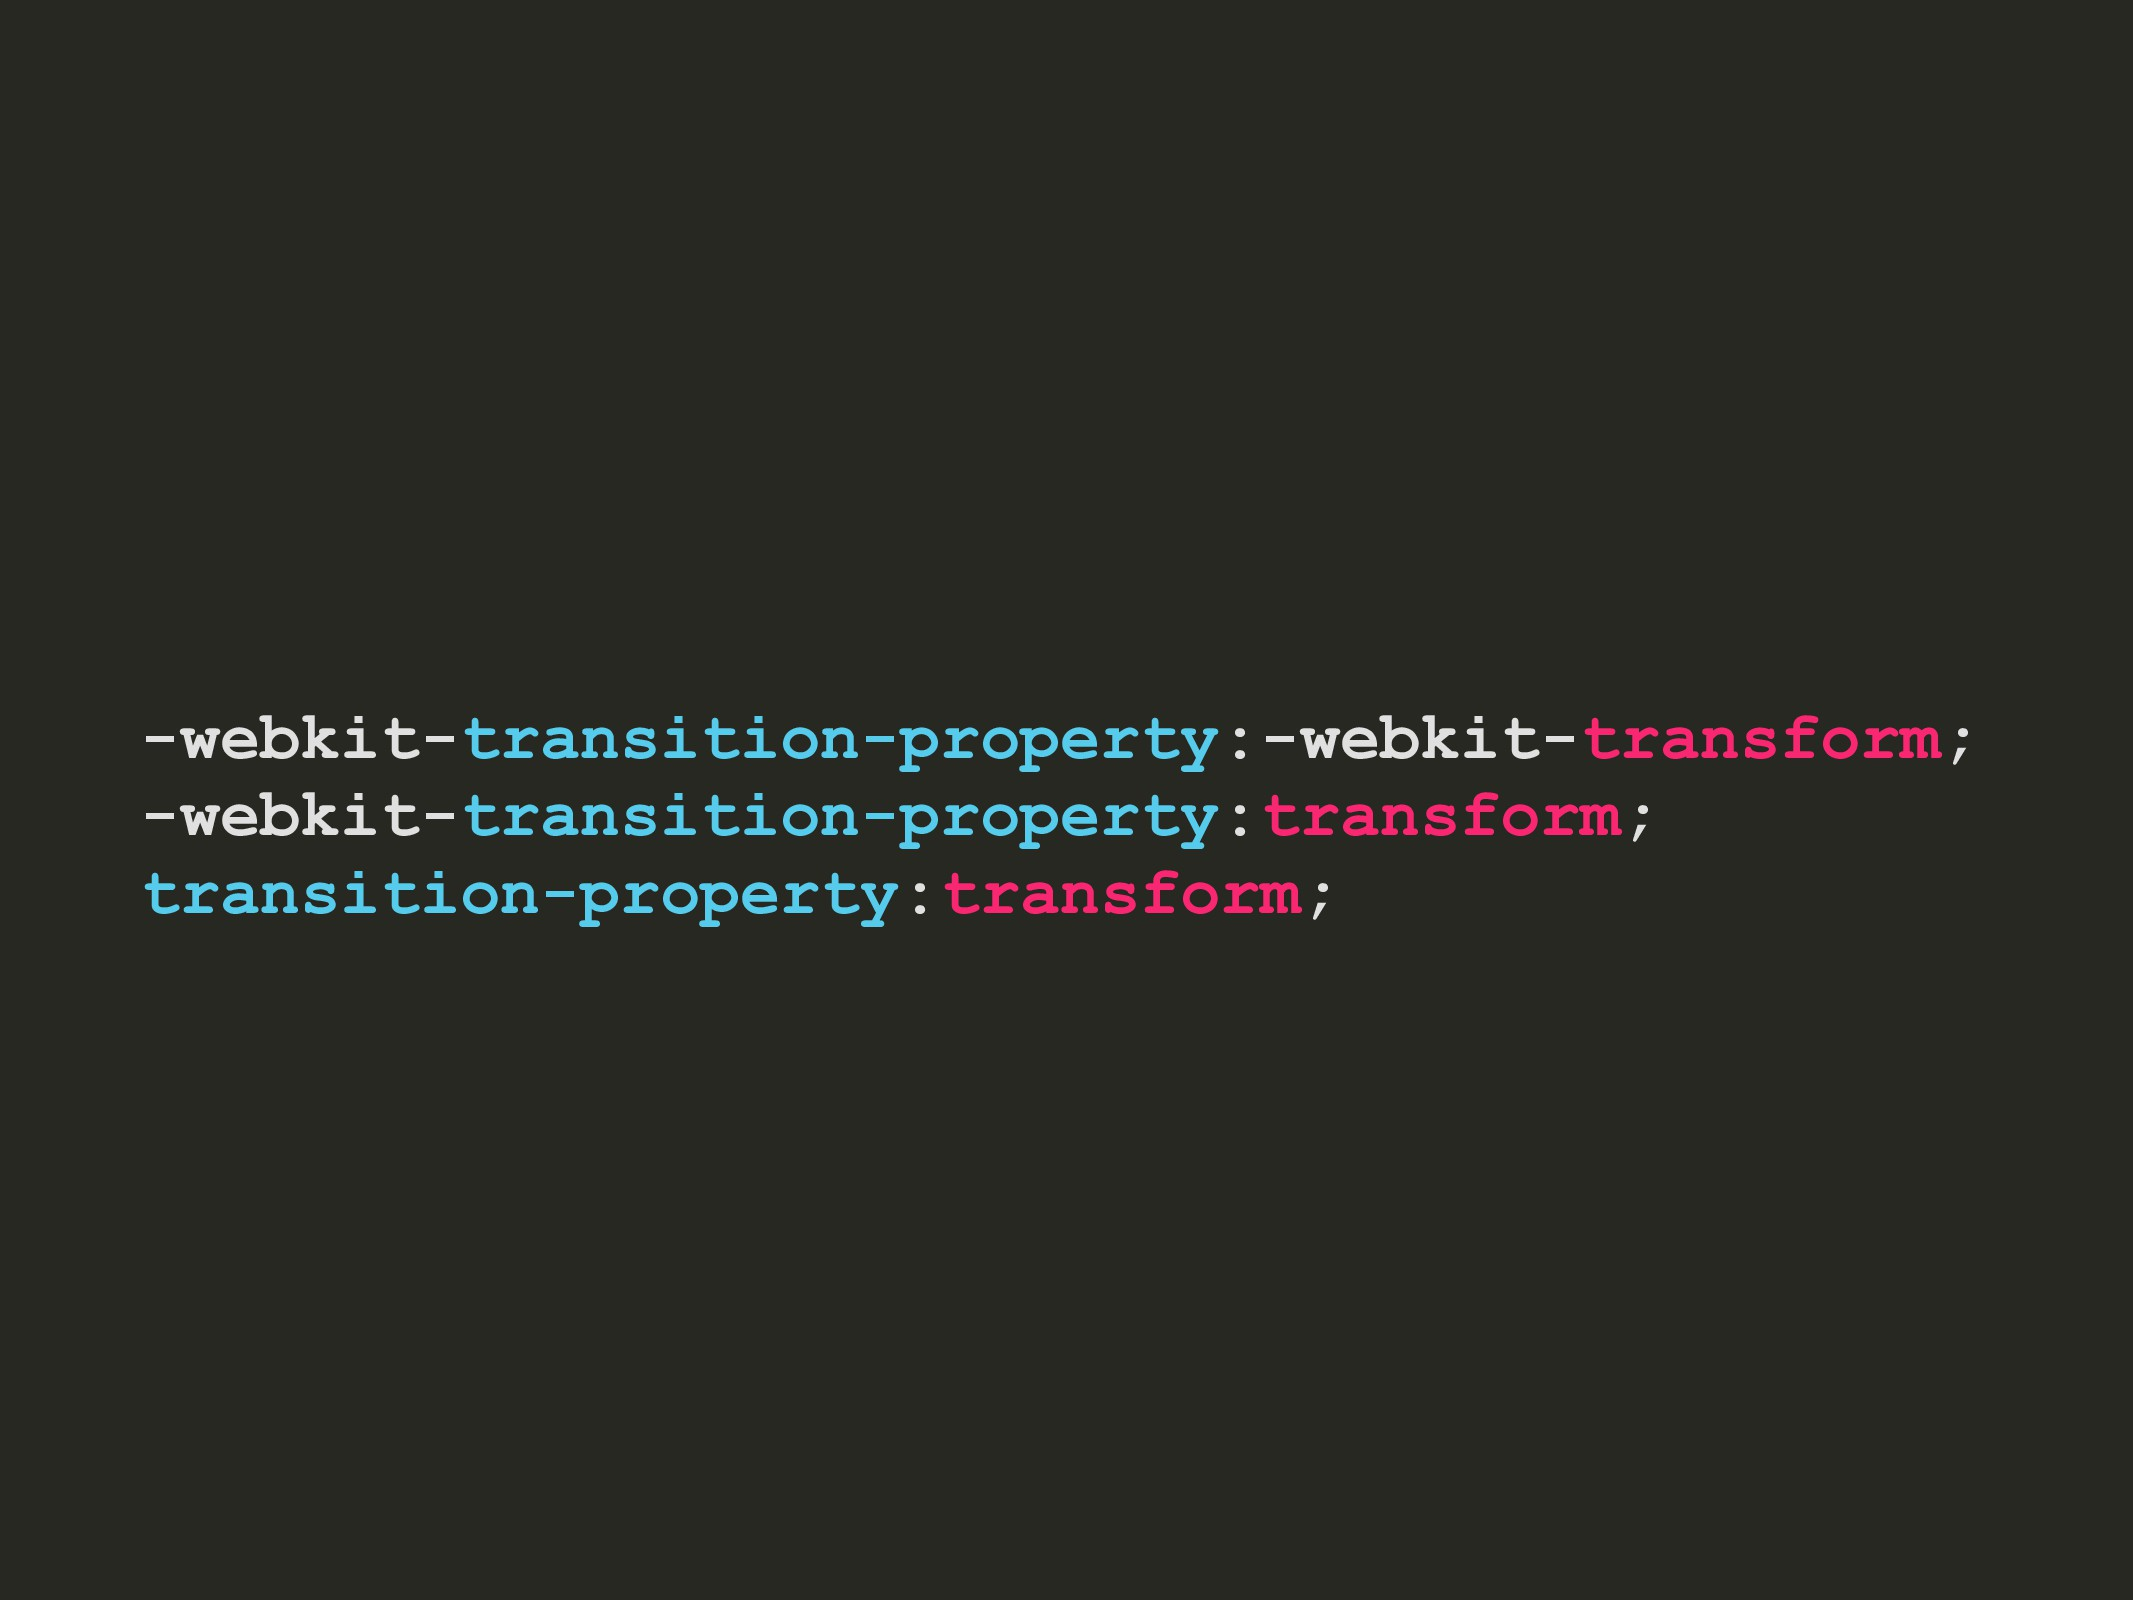 -webkit-transition-property:-webkit-transform; ...